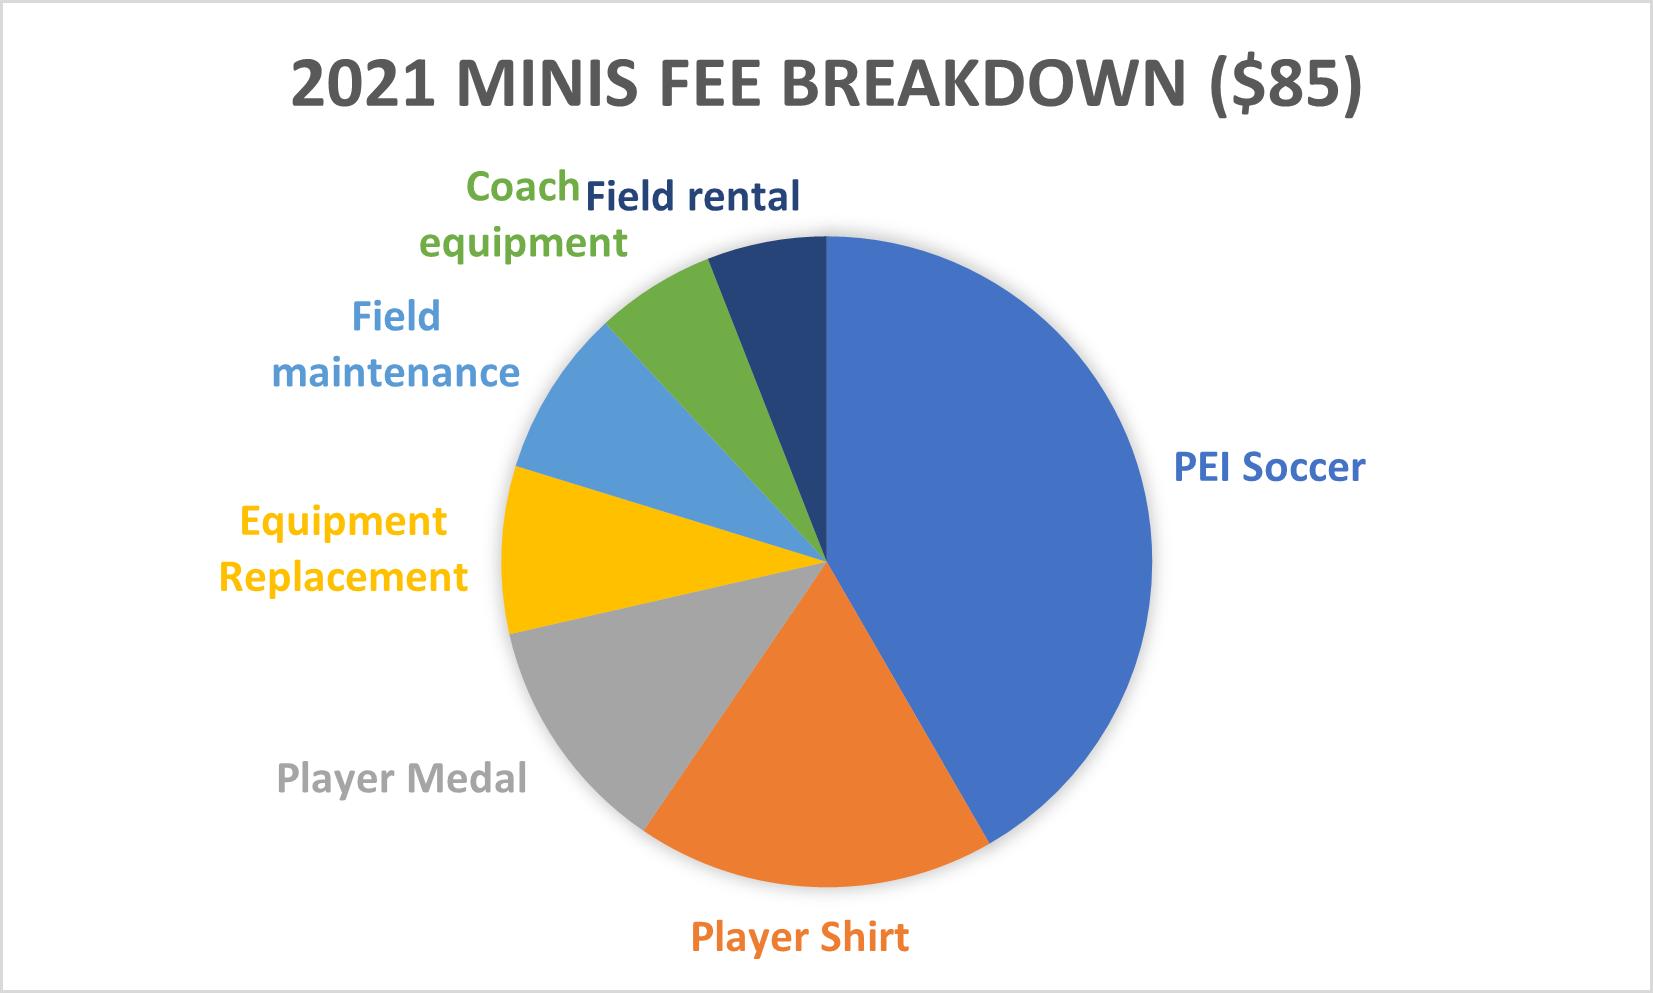 2021 Minis Fee Breakdown